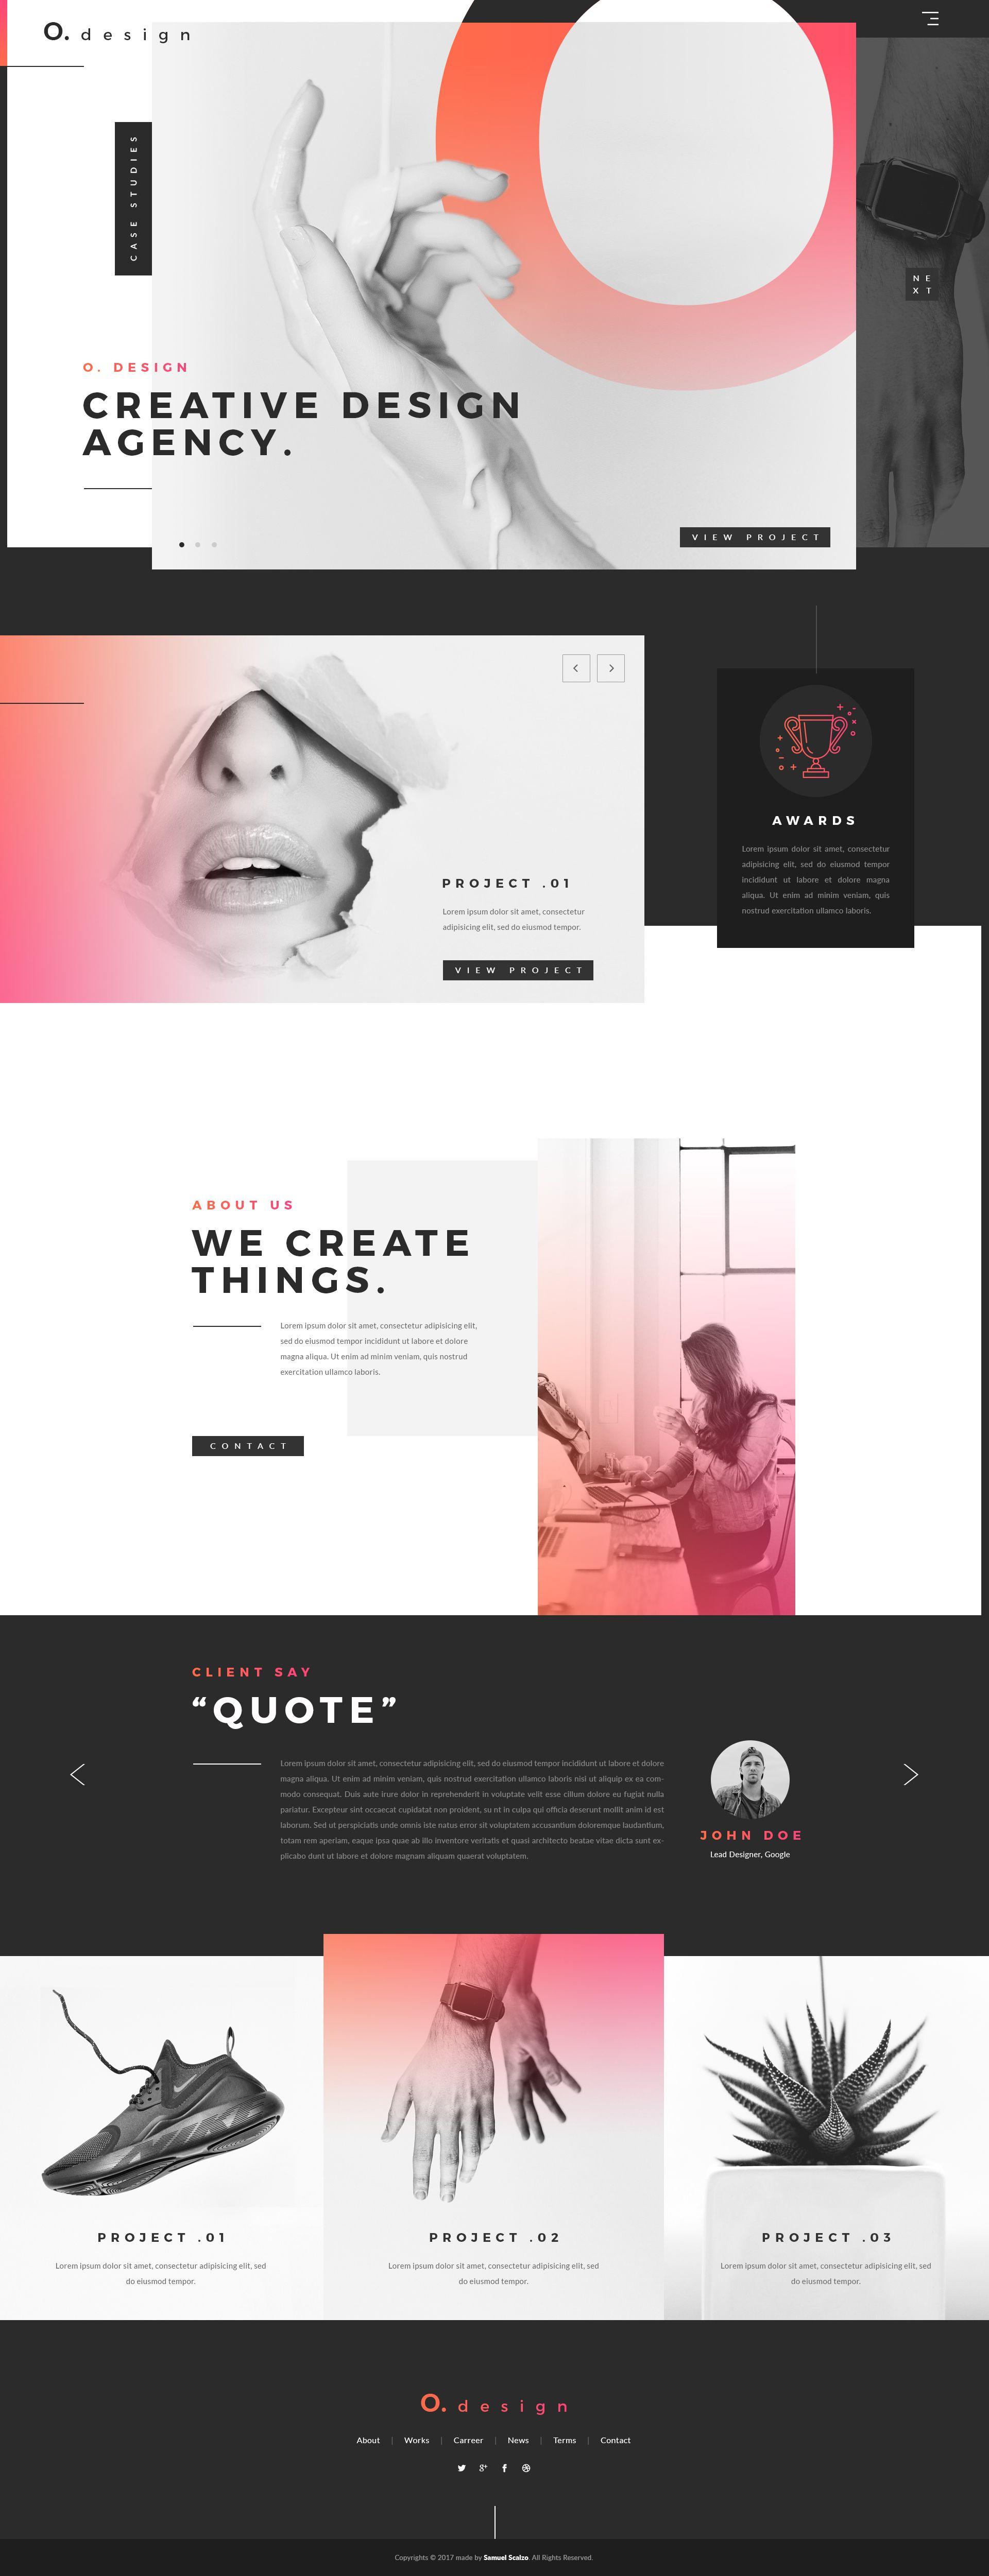 Creative design agency landing page hd